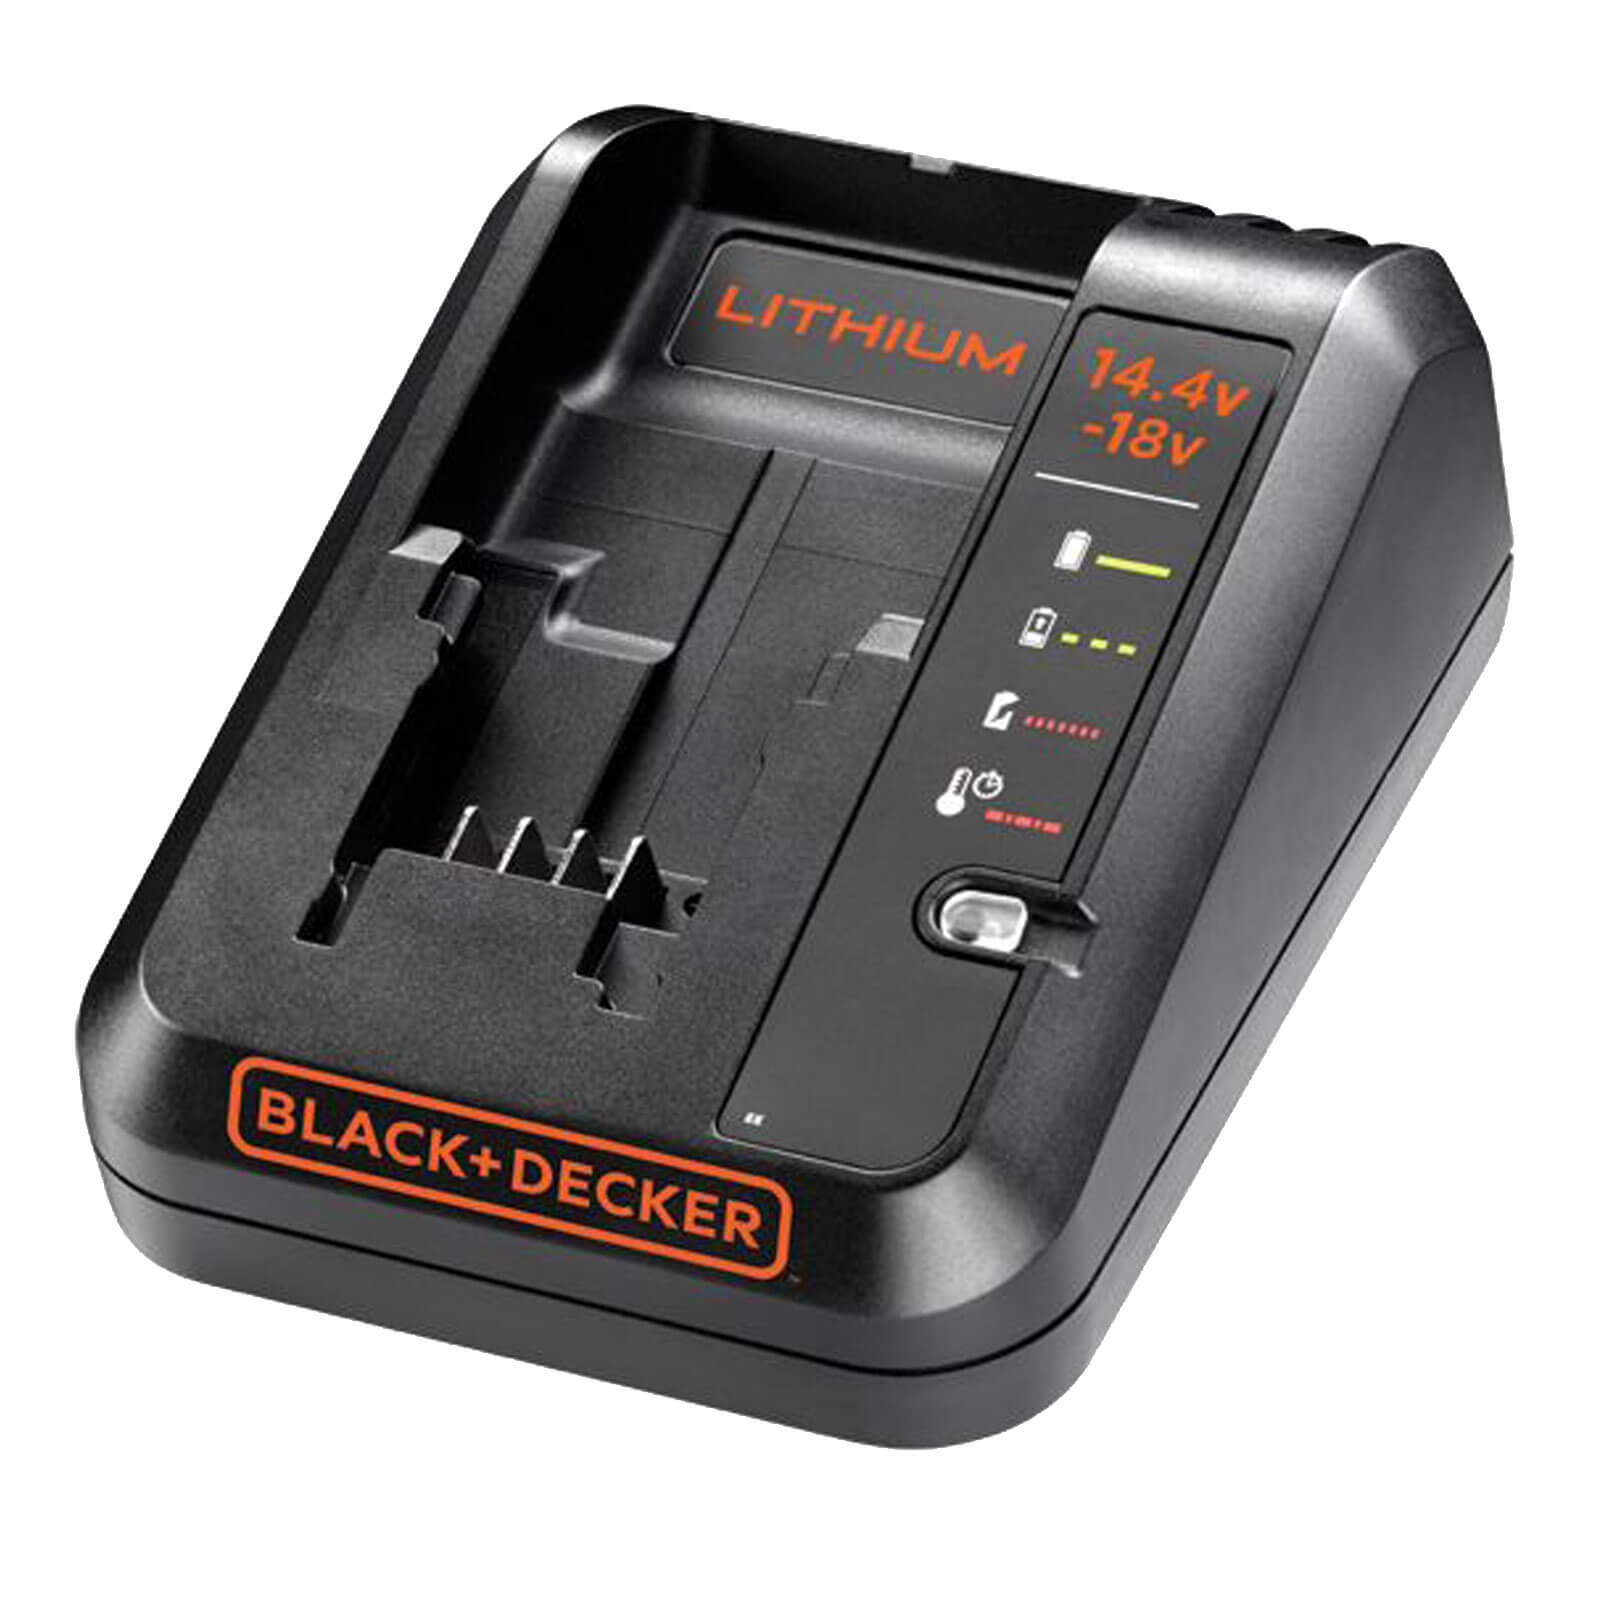 Image of Black & Decker BDC1A 18v Cordless Li-ion Battery Charger 240v